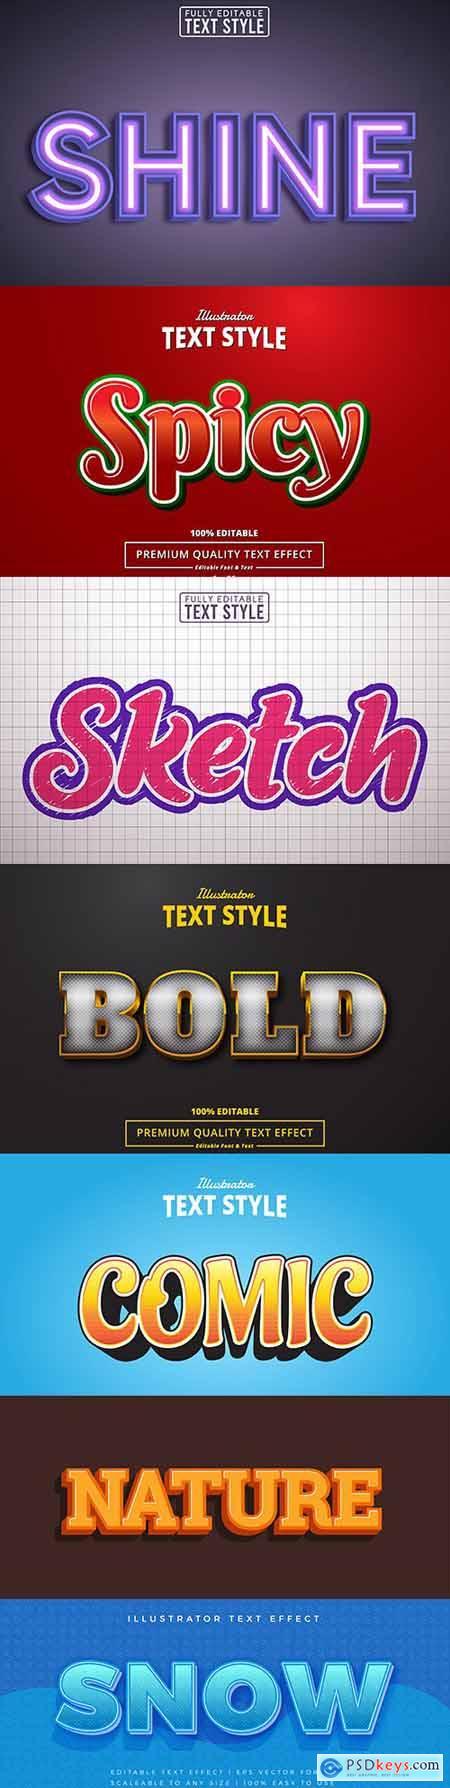 Editable font effect text collection illustration design 51